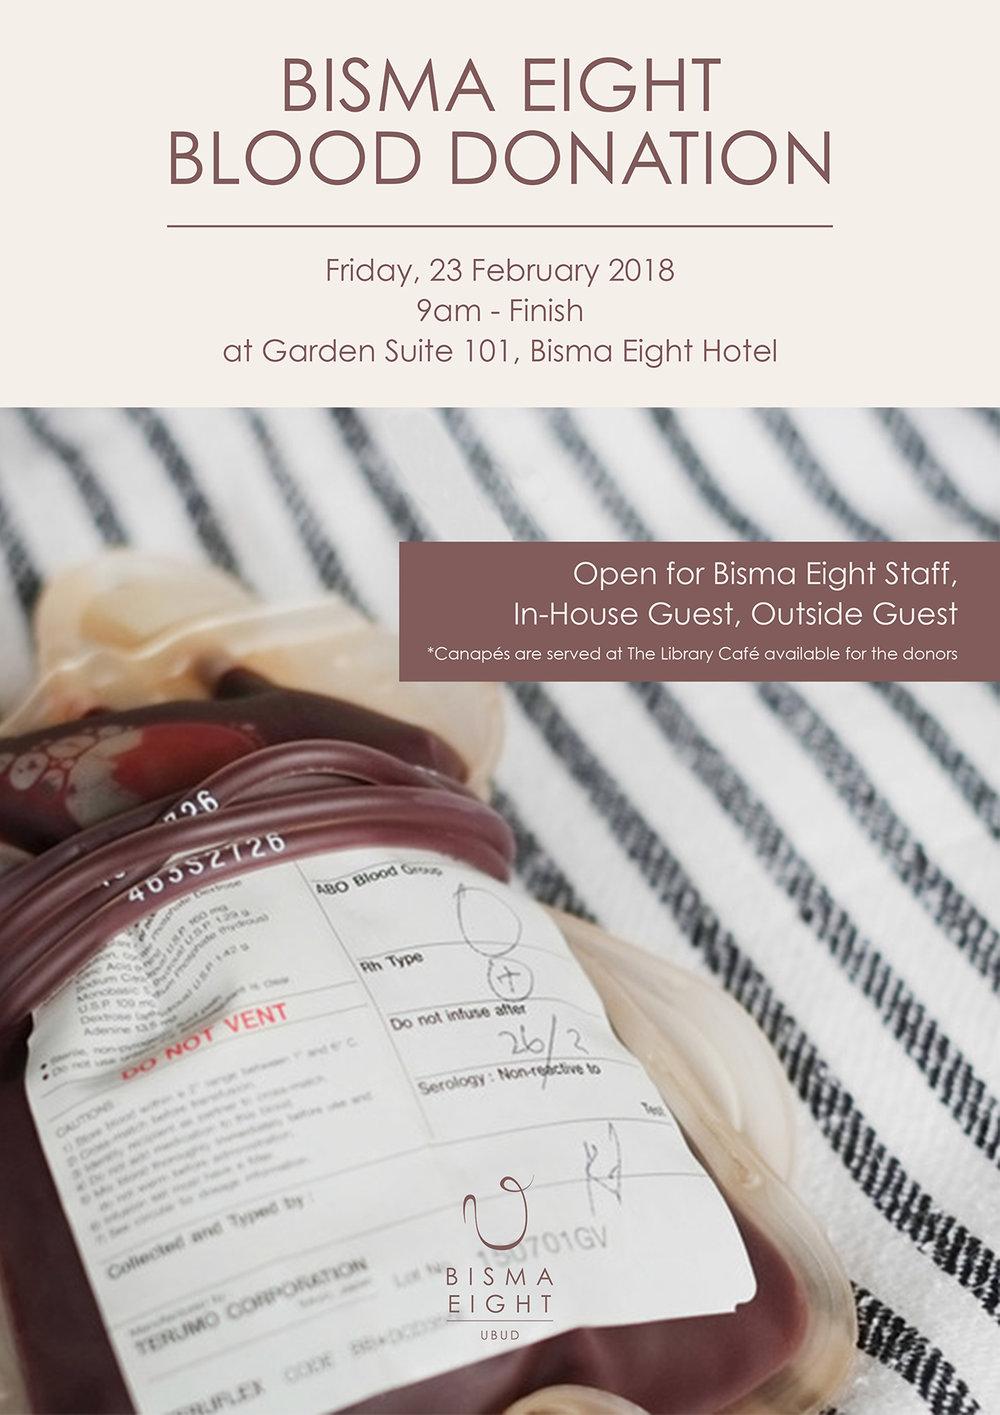 Friday, 23 February 2018 at 9 AM